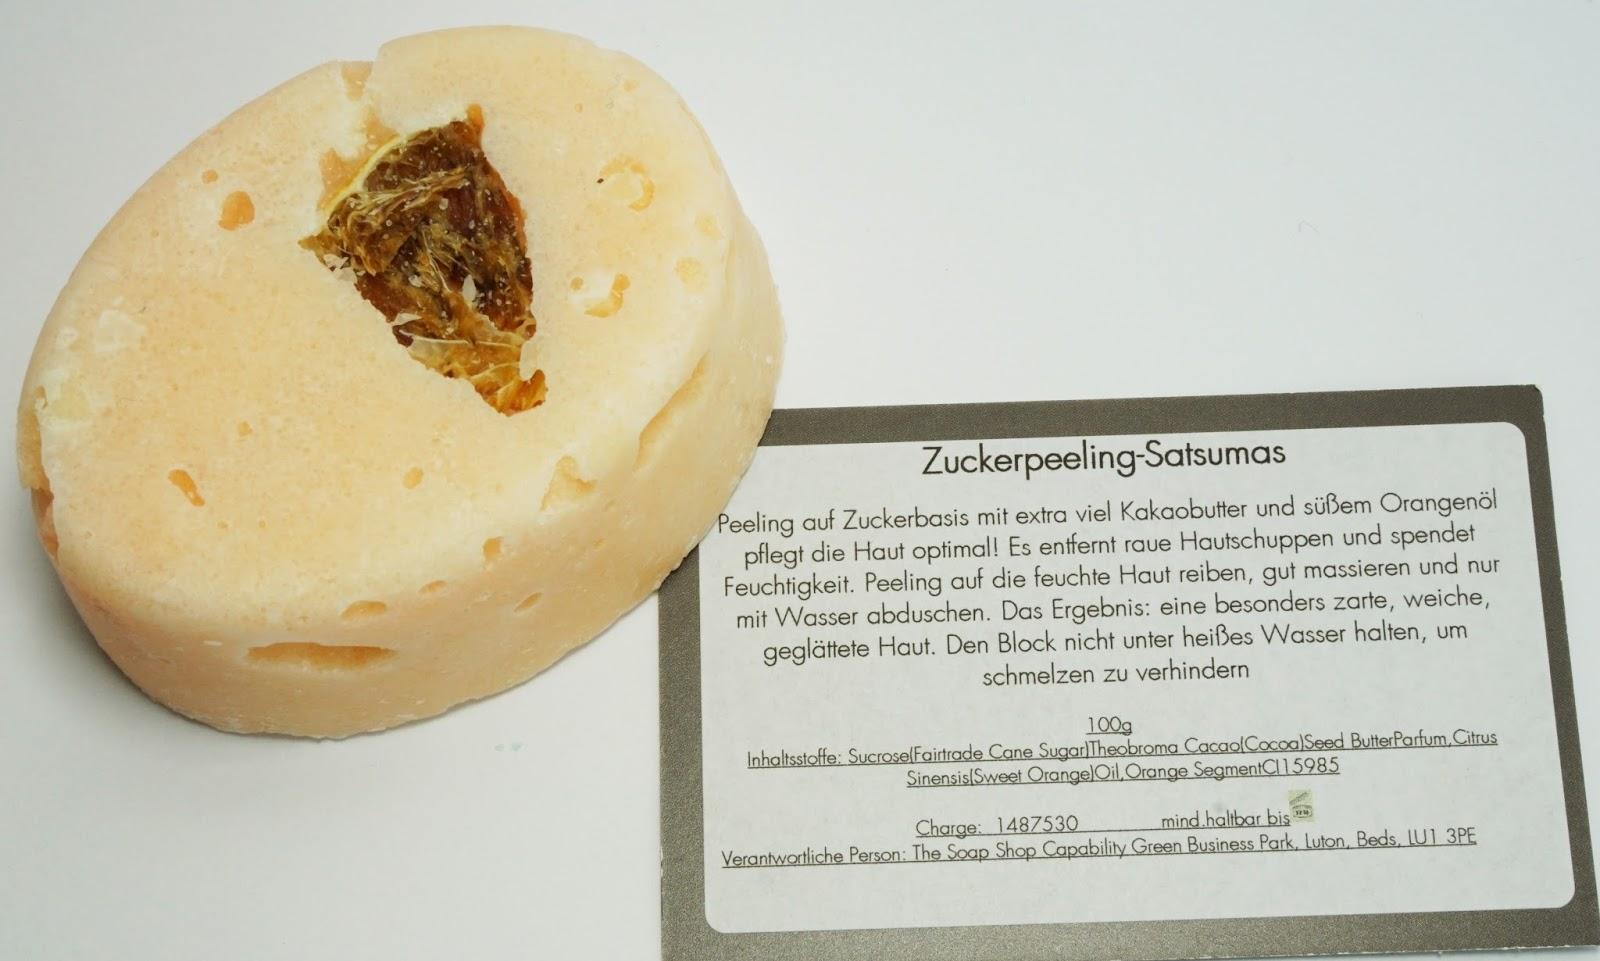 Badegeister - Zuckerpeeling - Satsumas